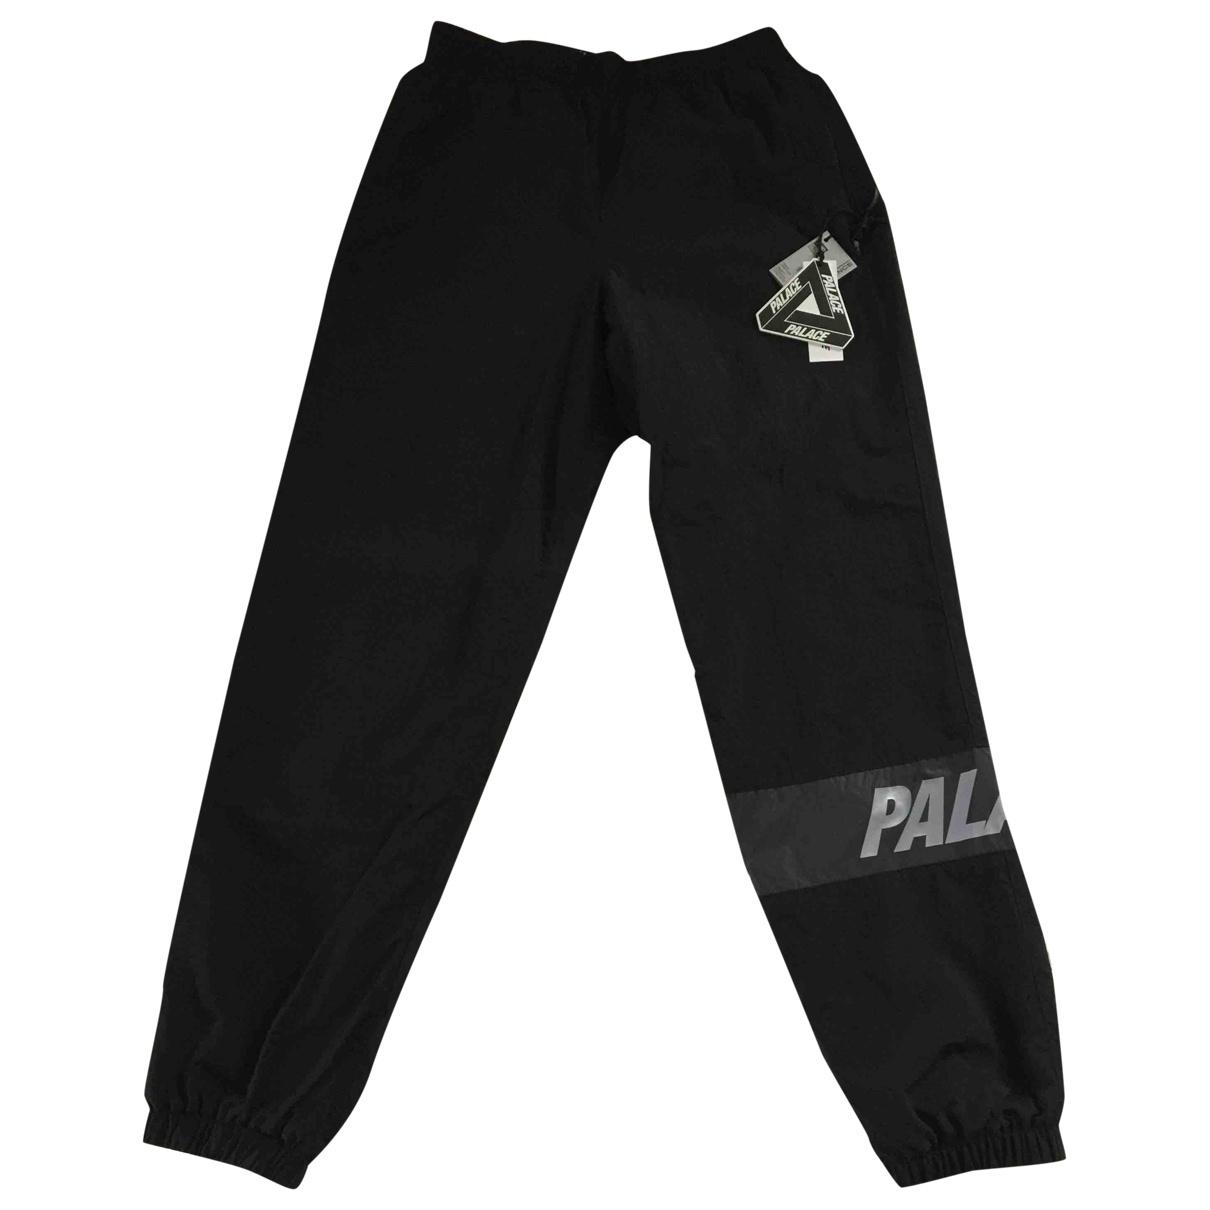 Pantalones en Poliester Negro Palace